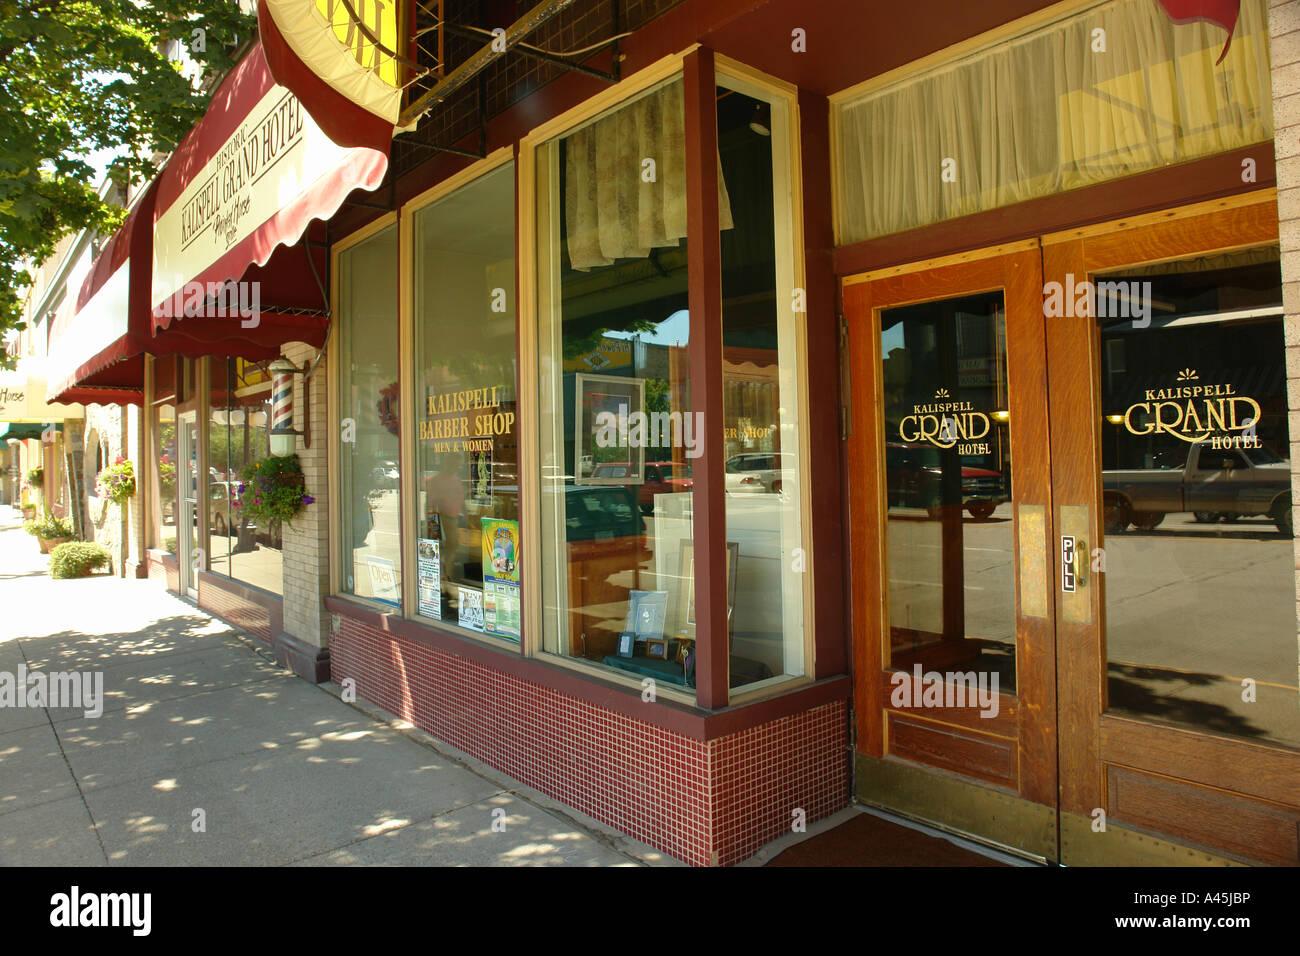 AJD56538, Kalispell, MT, Montana, Historic Downtown, Grand Hotel - Stock Image